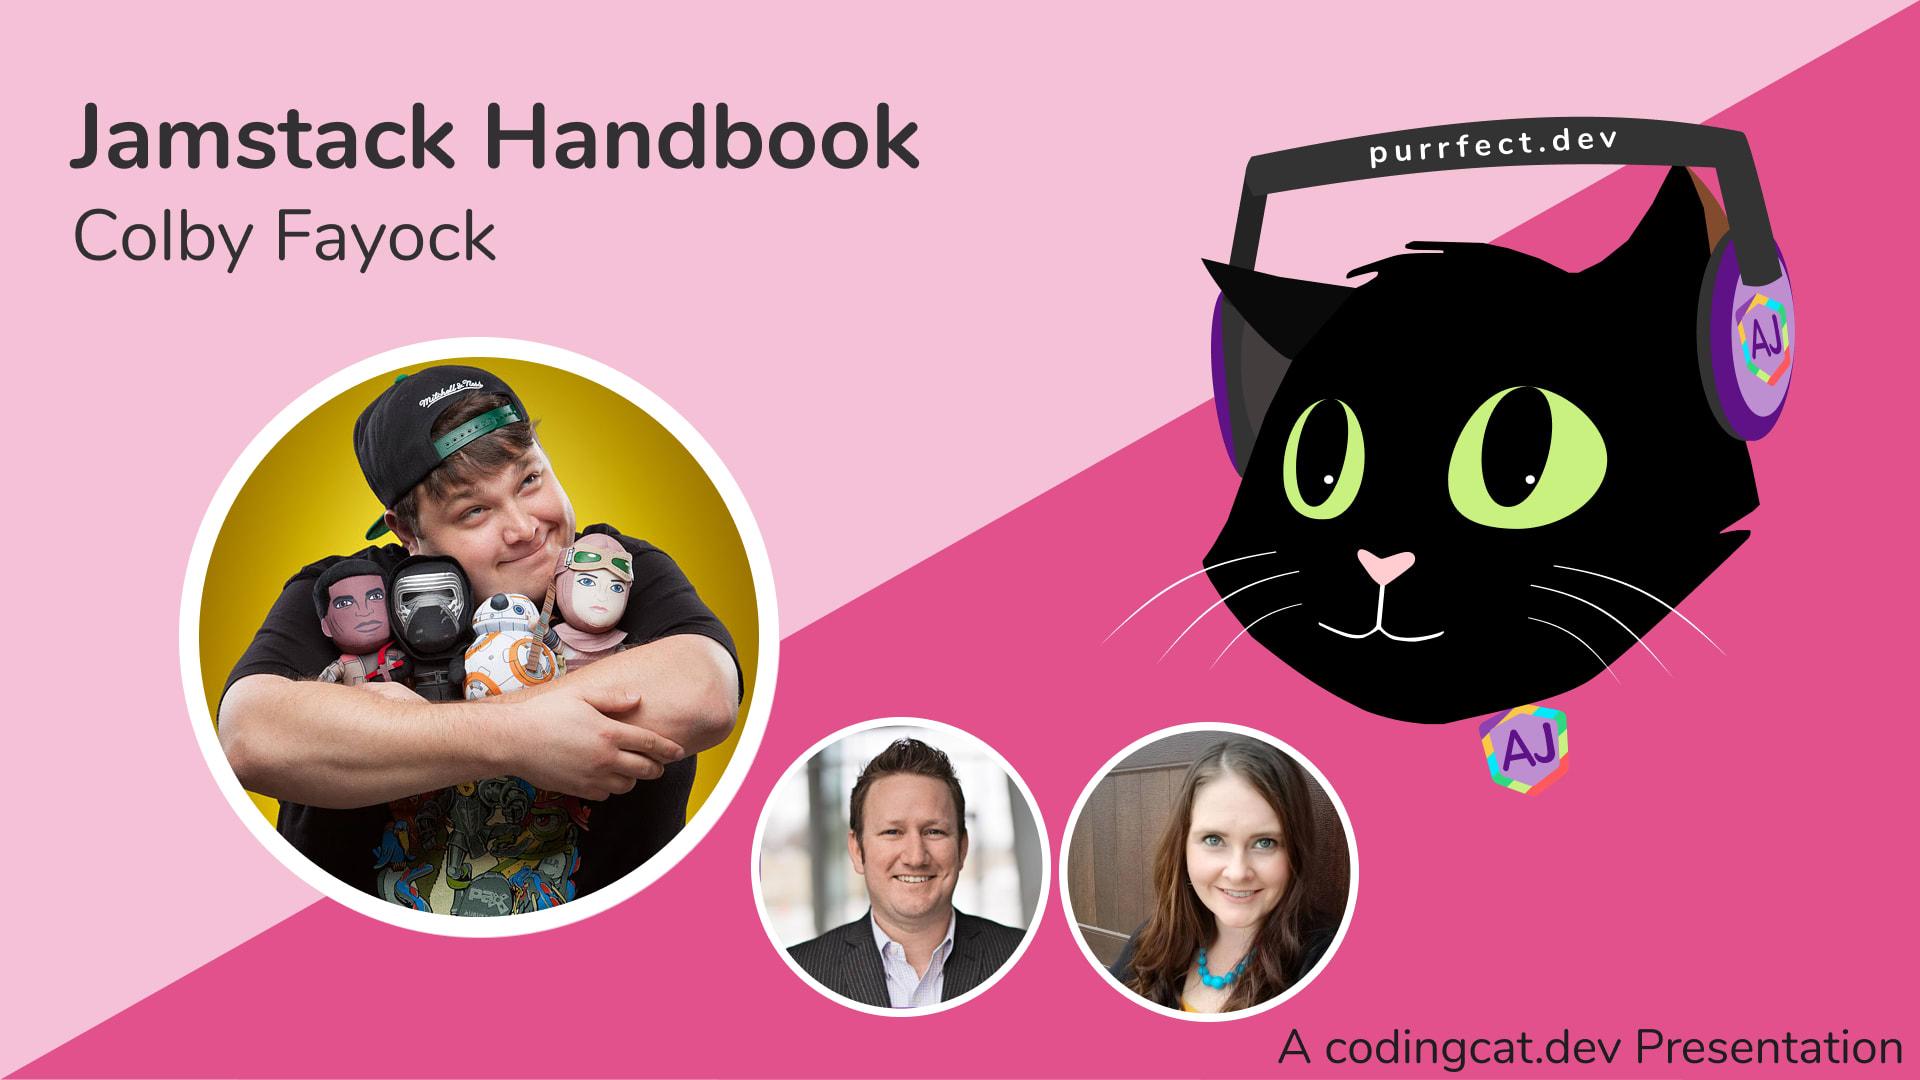 1.6 - Jamstack Handbook with Colby Fayock